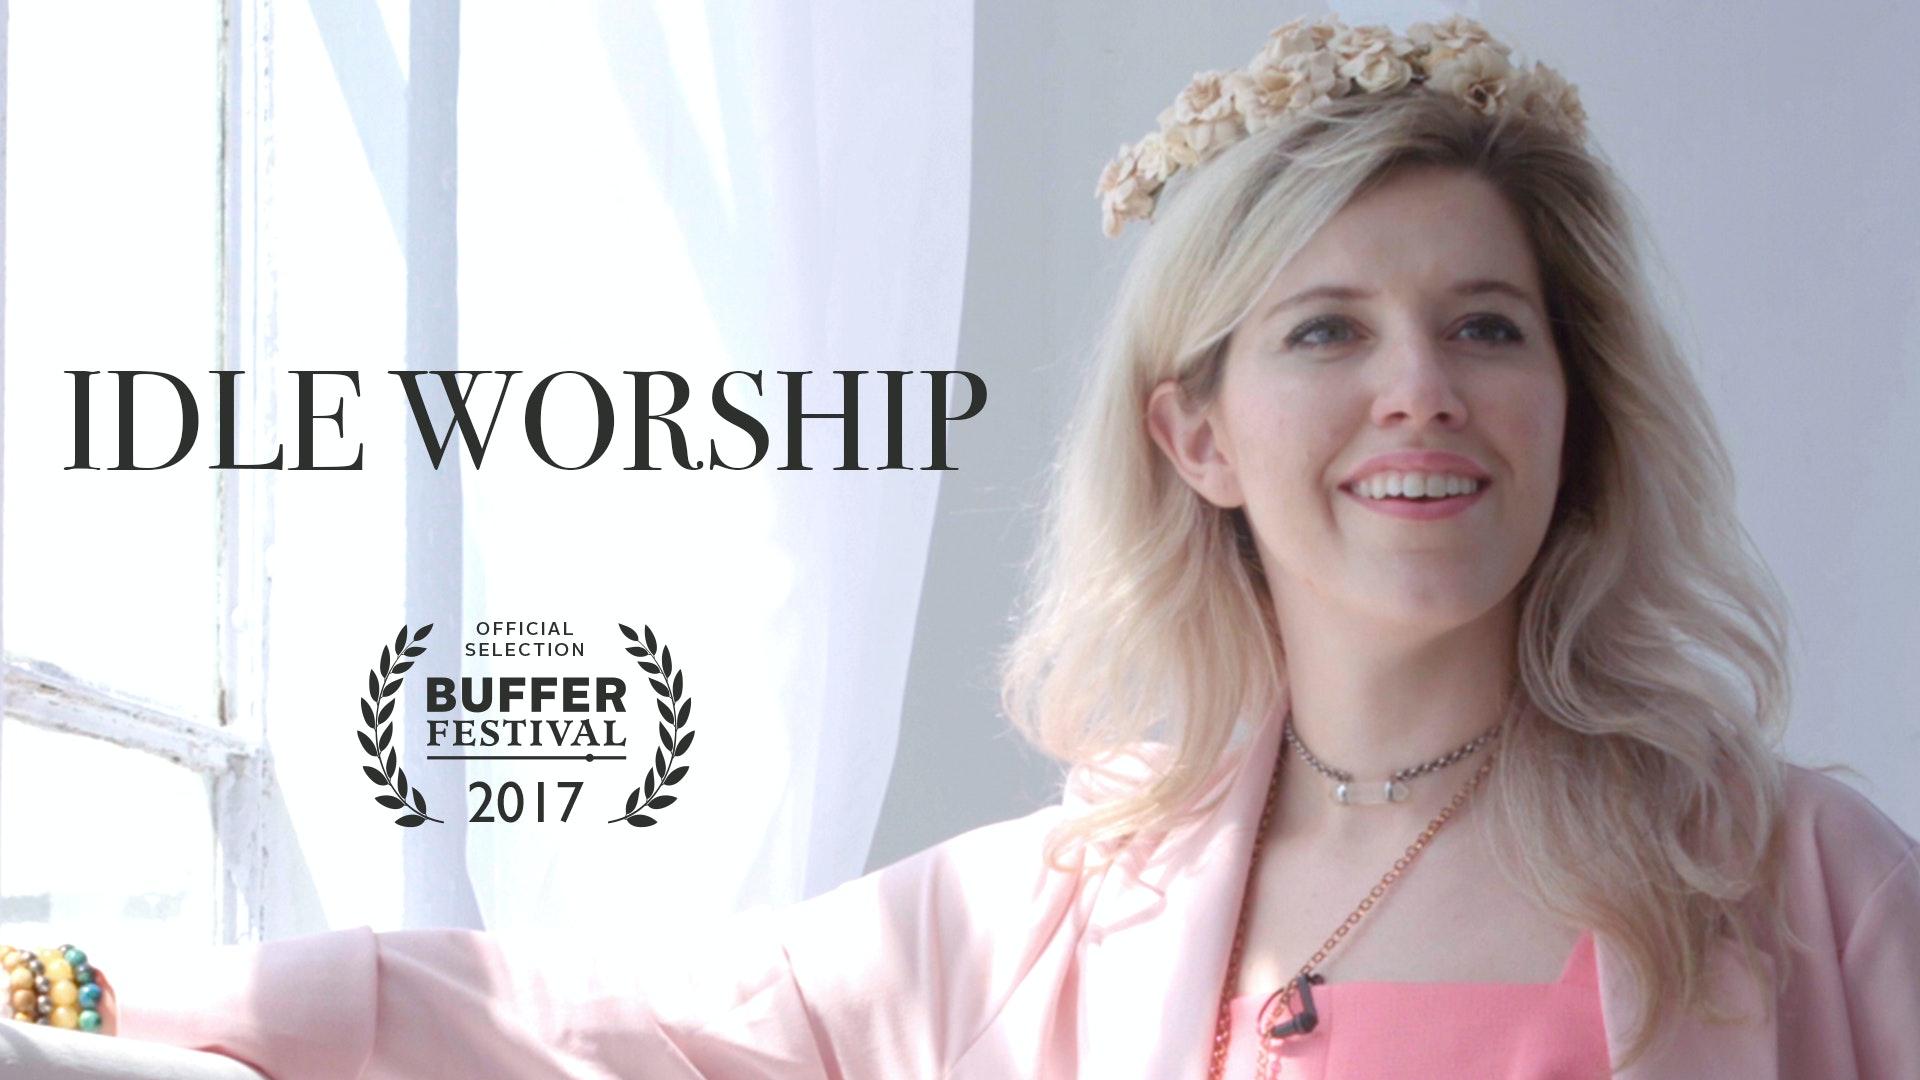 IDLE WORSHIP Digital Download